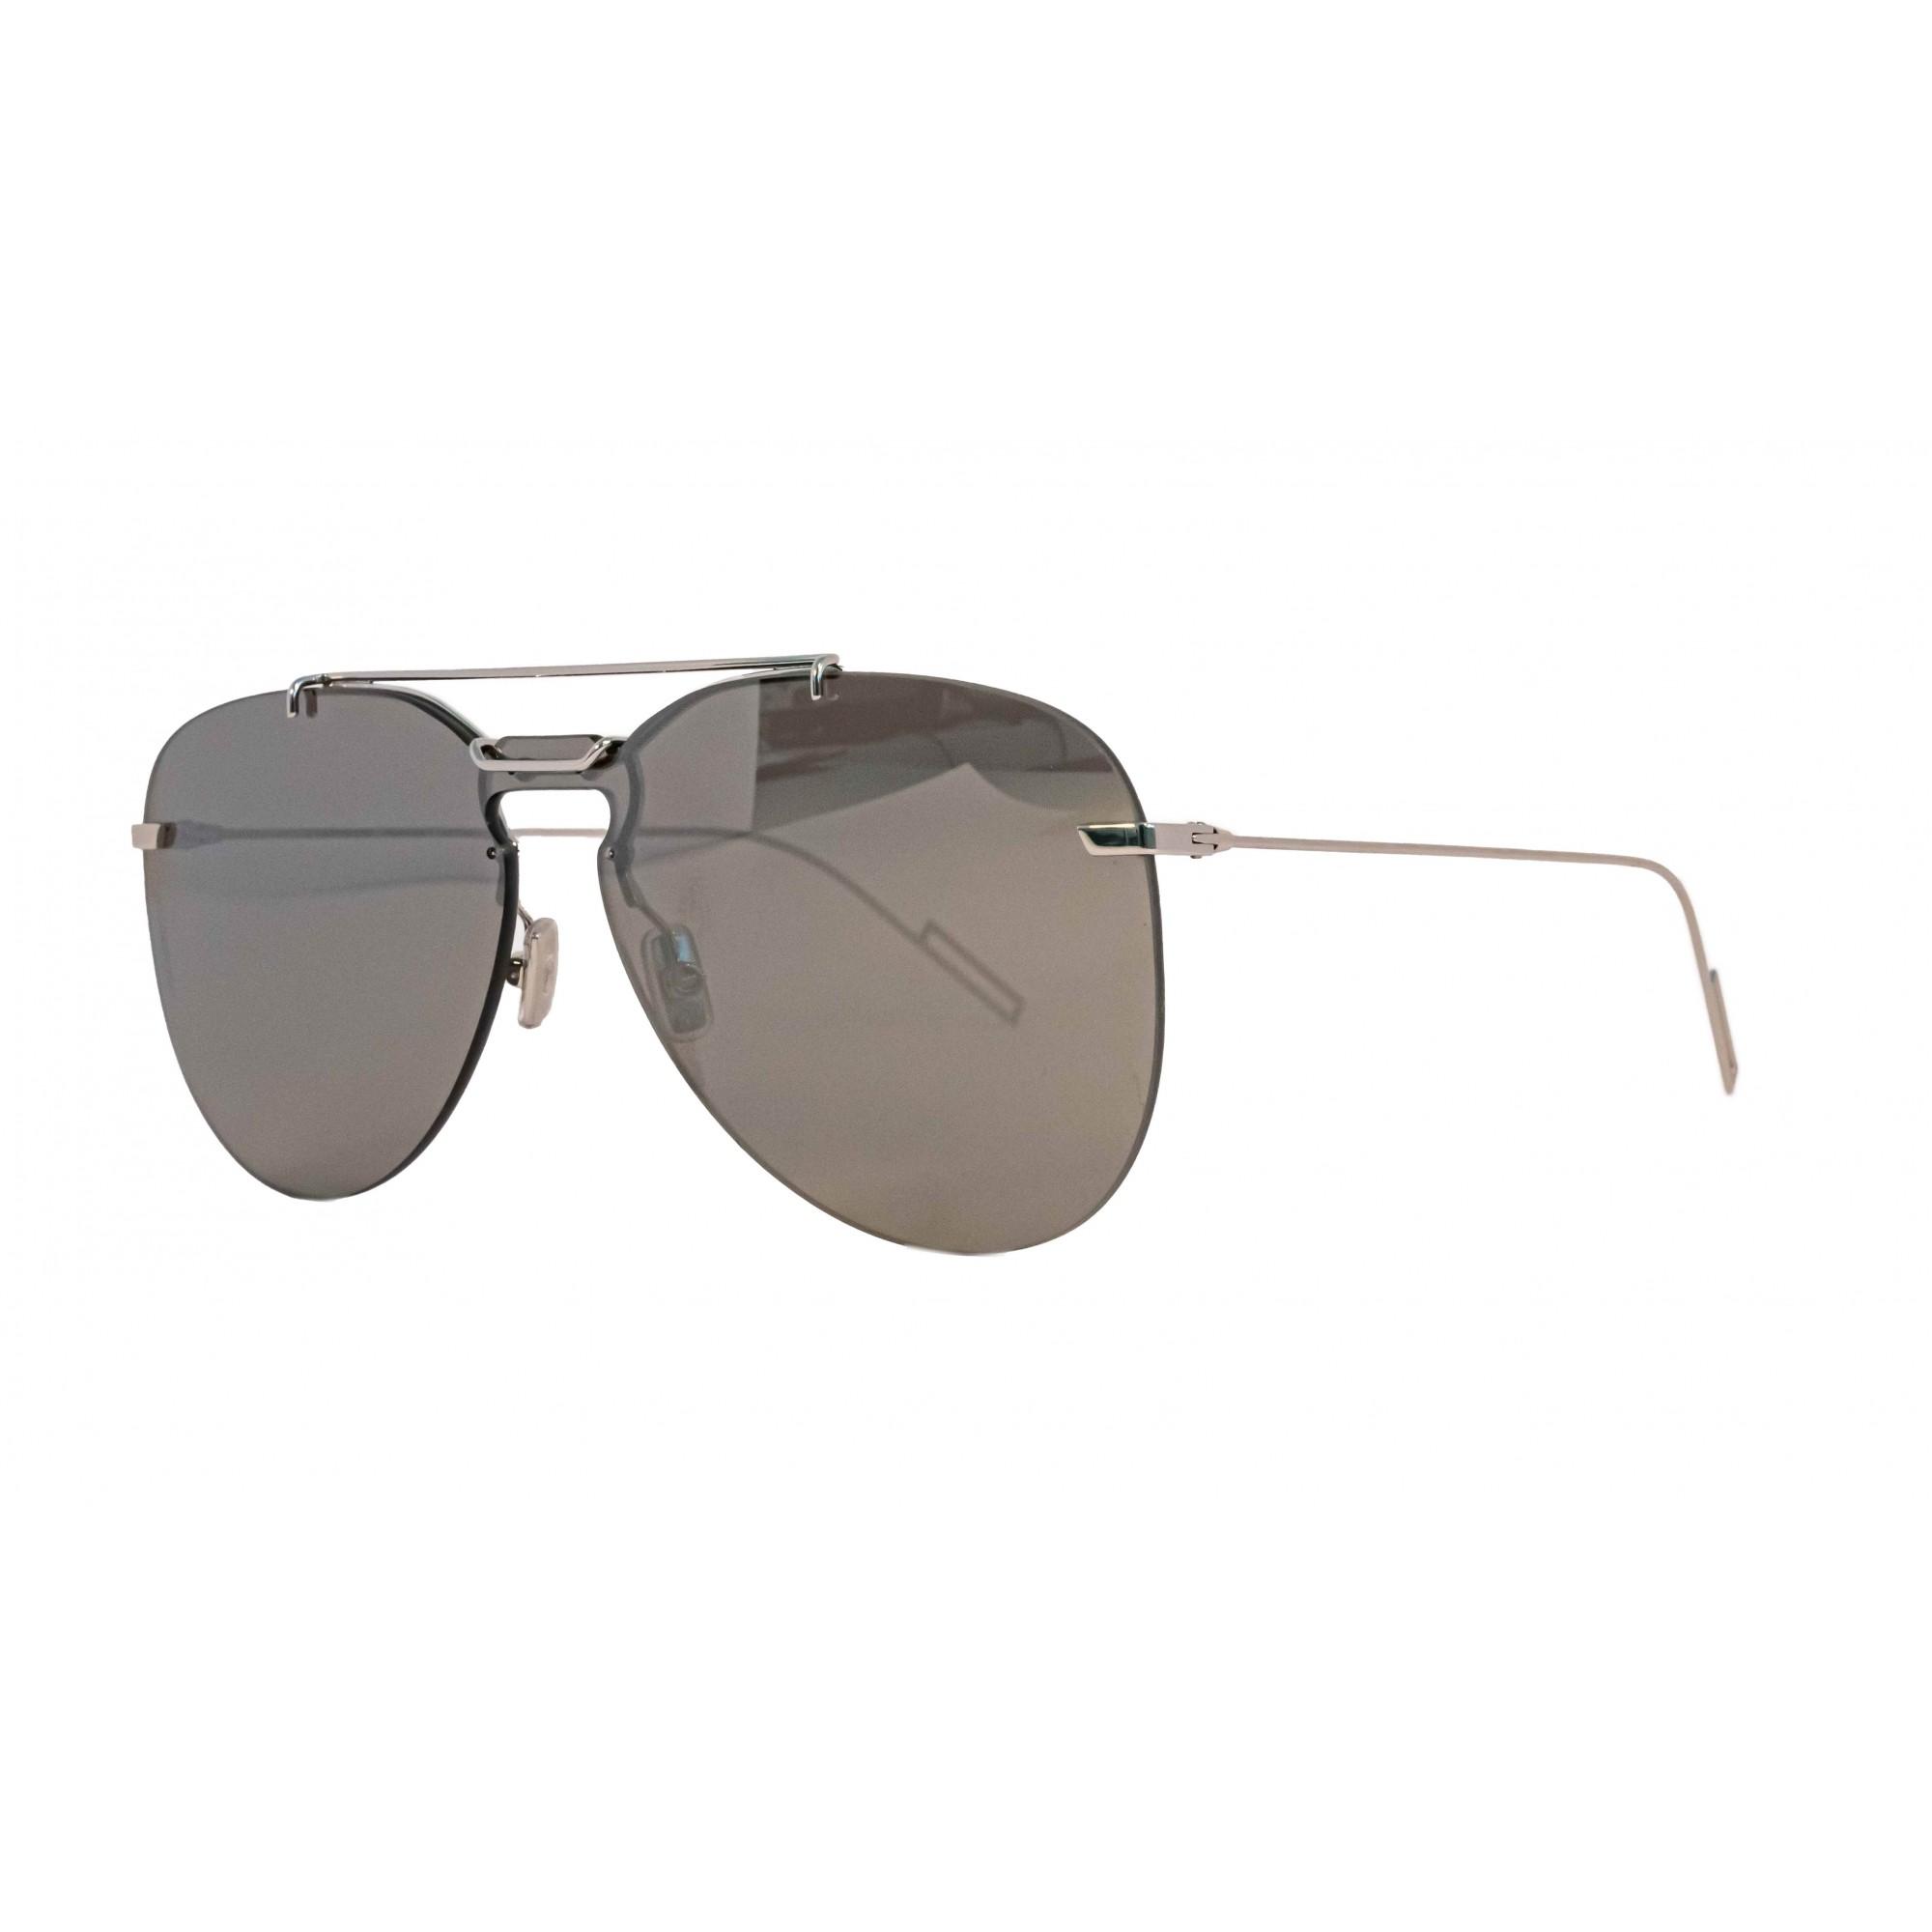 Óculos Dior Aviador 0222s 0100t Tu Prateado